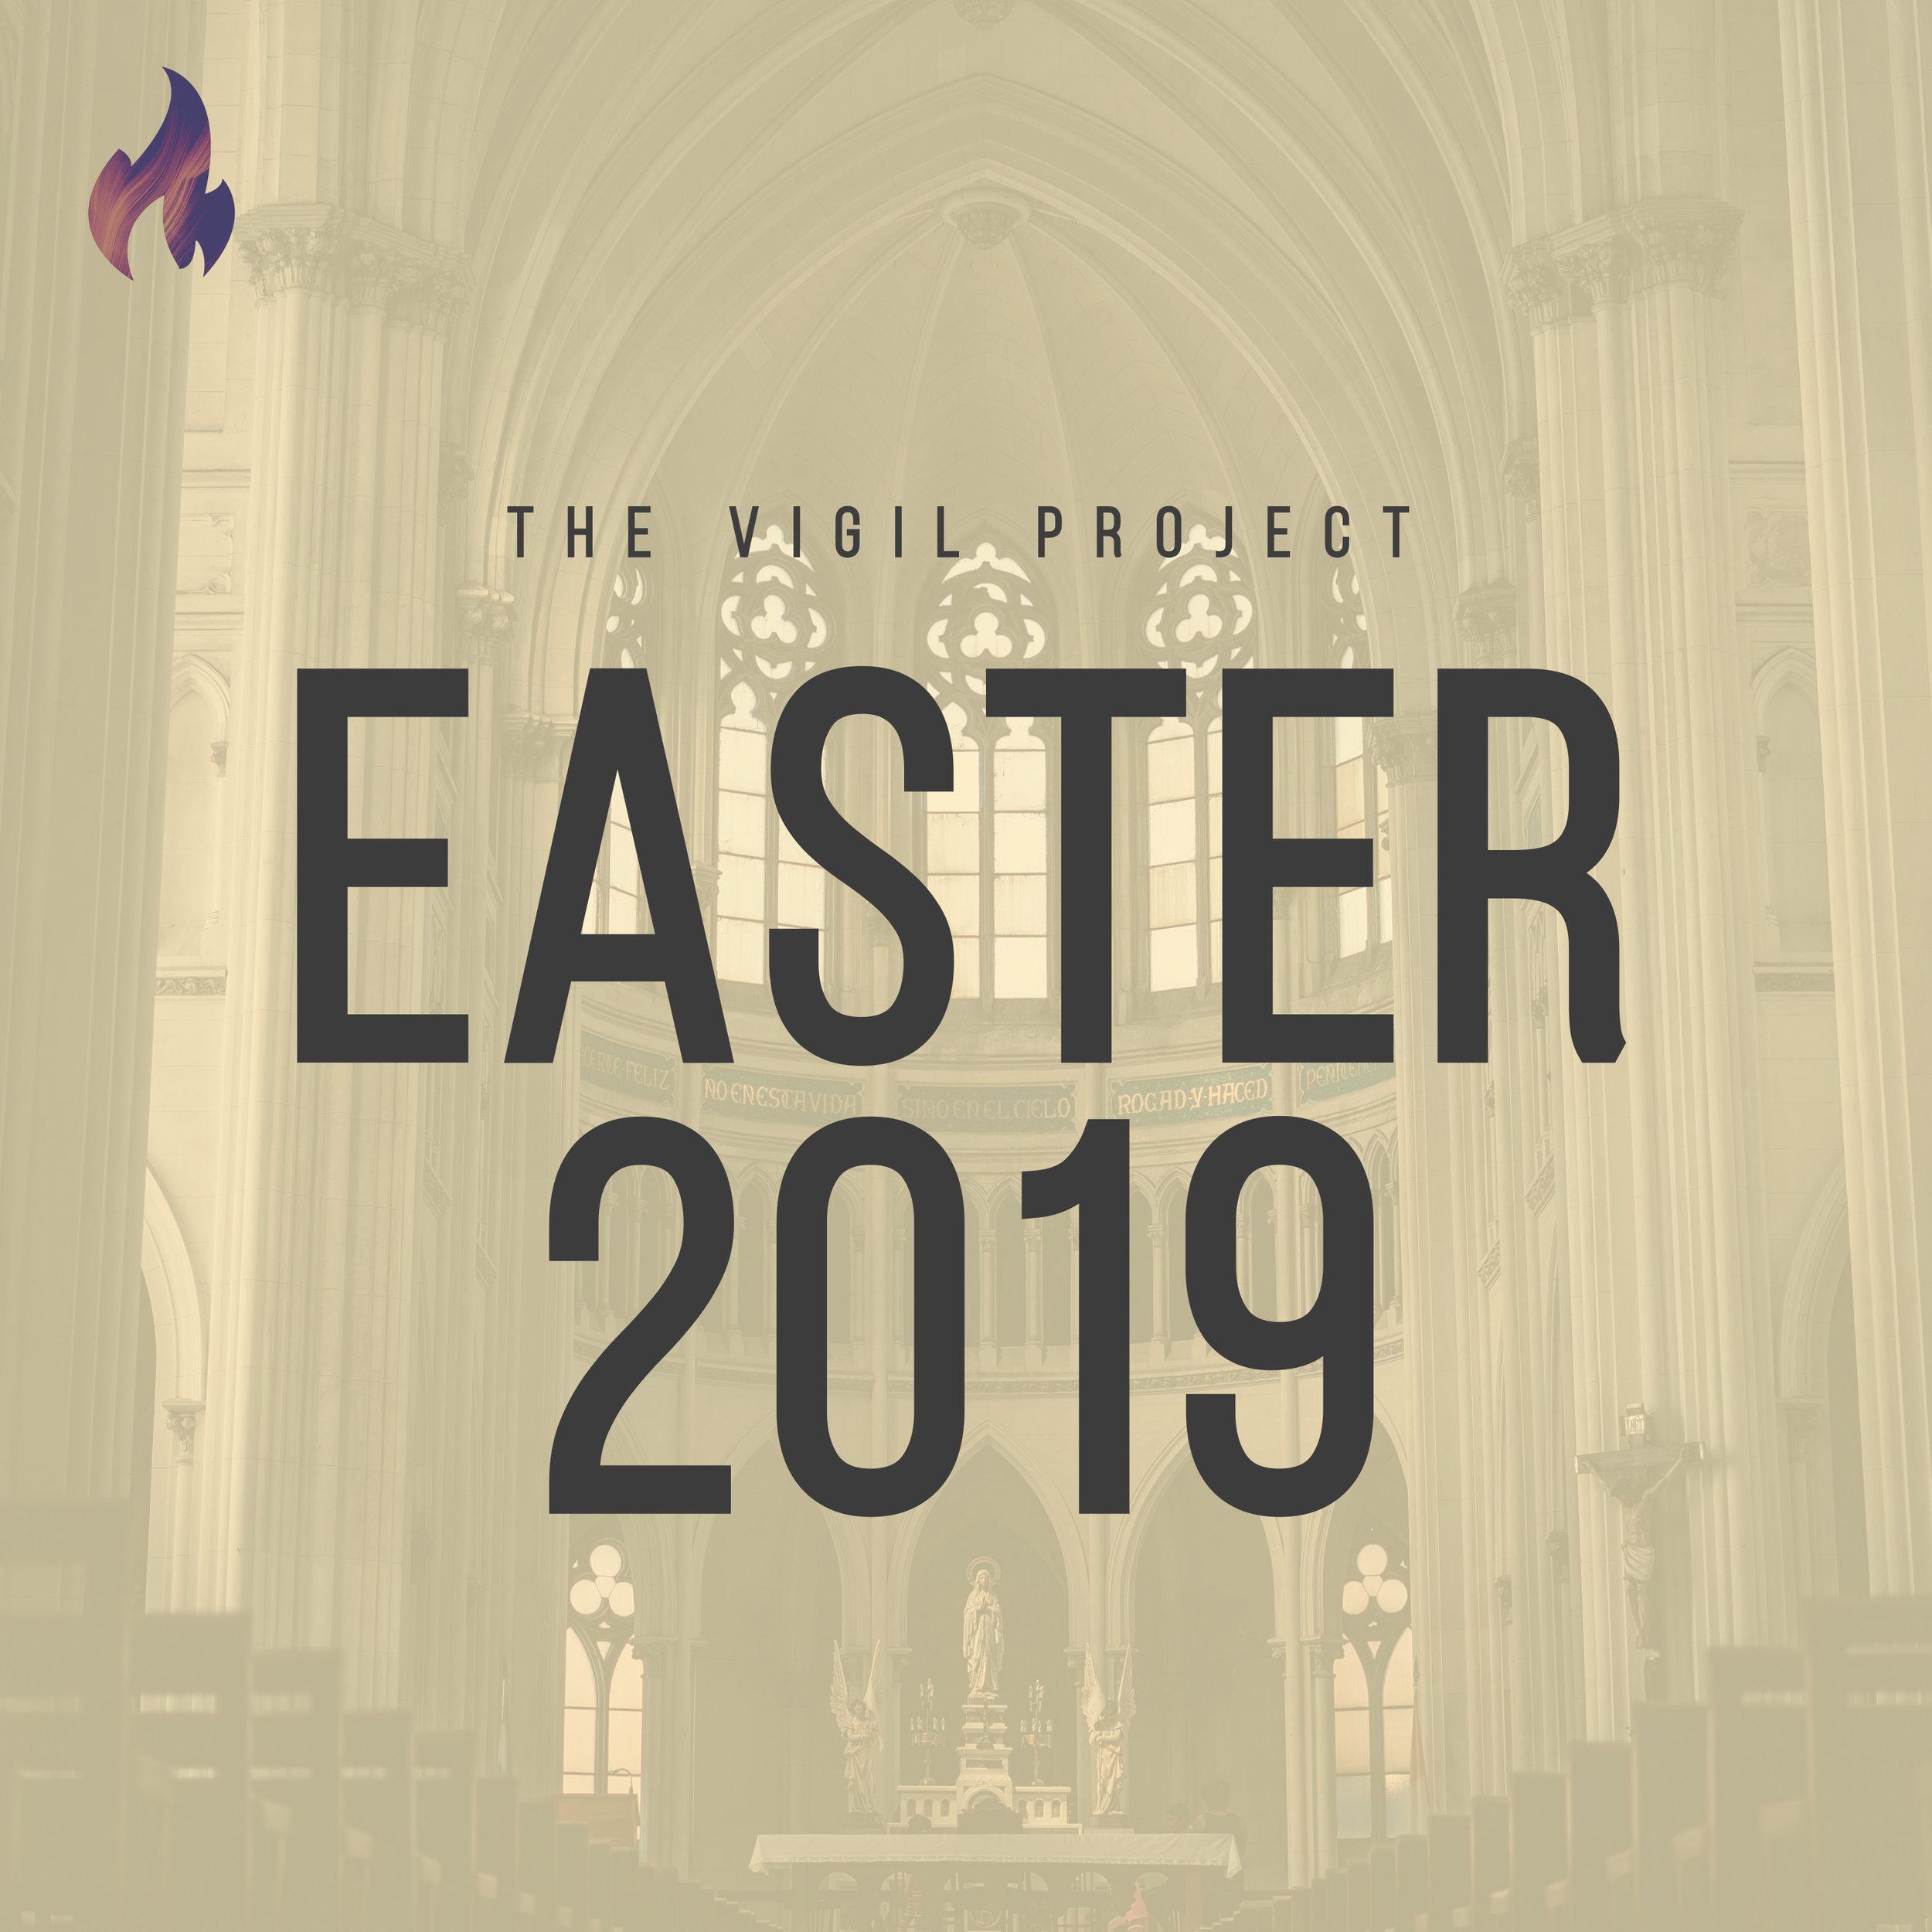 Easter 2019 Spotify.jpg